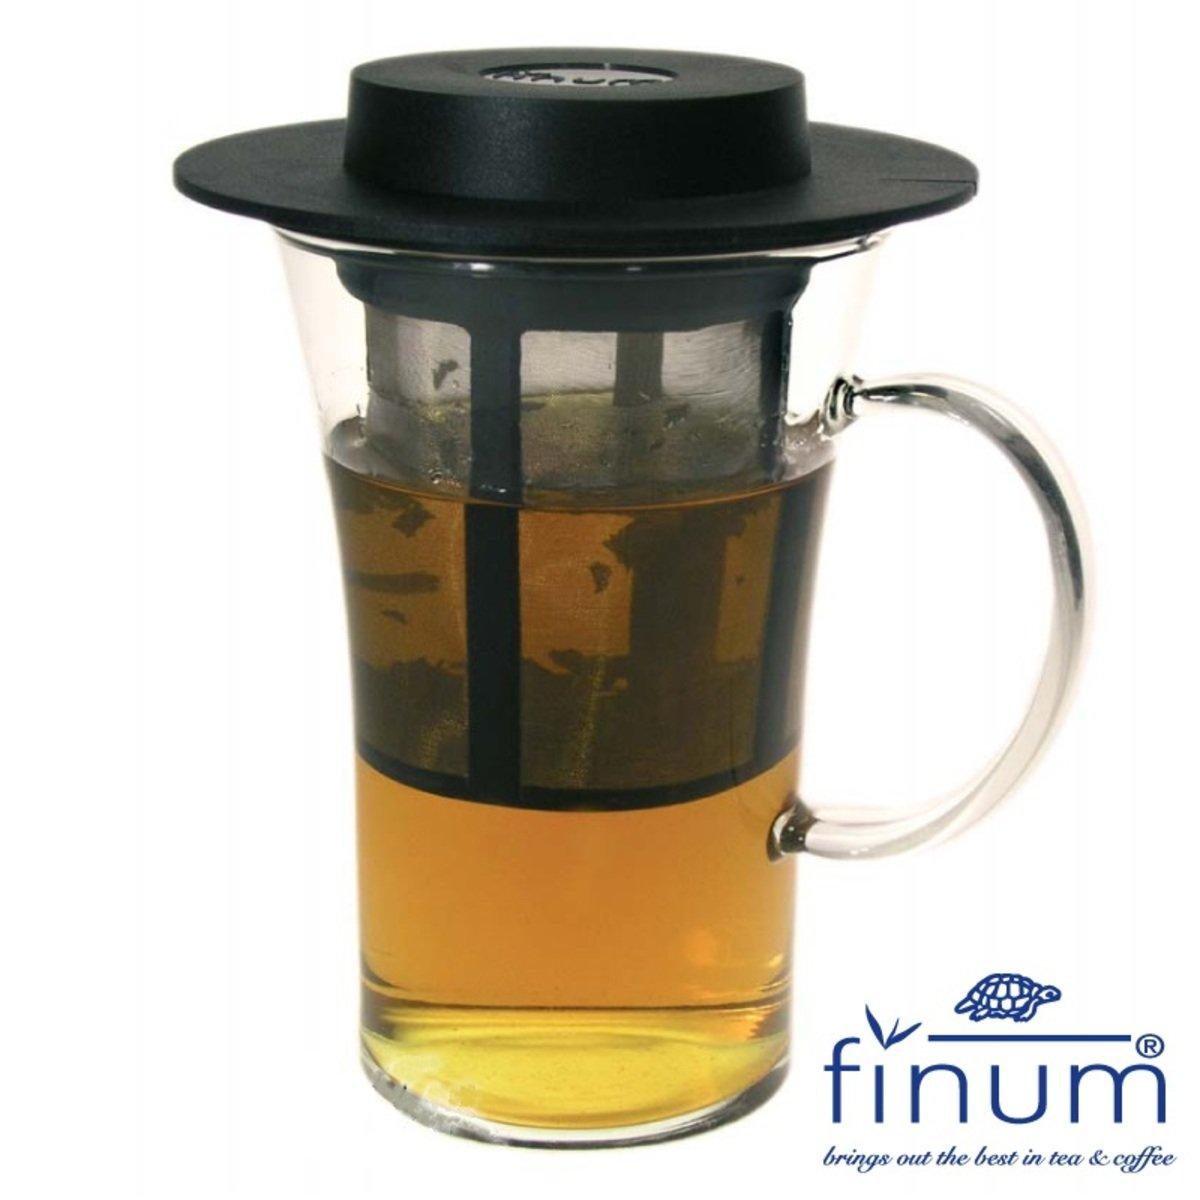 finum Bistro System – 耐熱玻璃杯連茶隔+兩用蓋